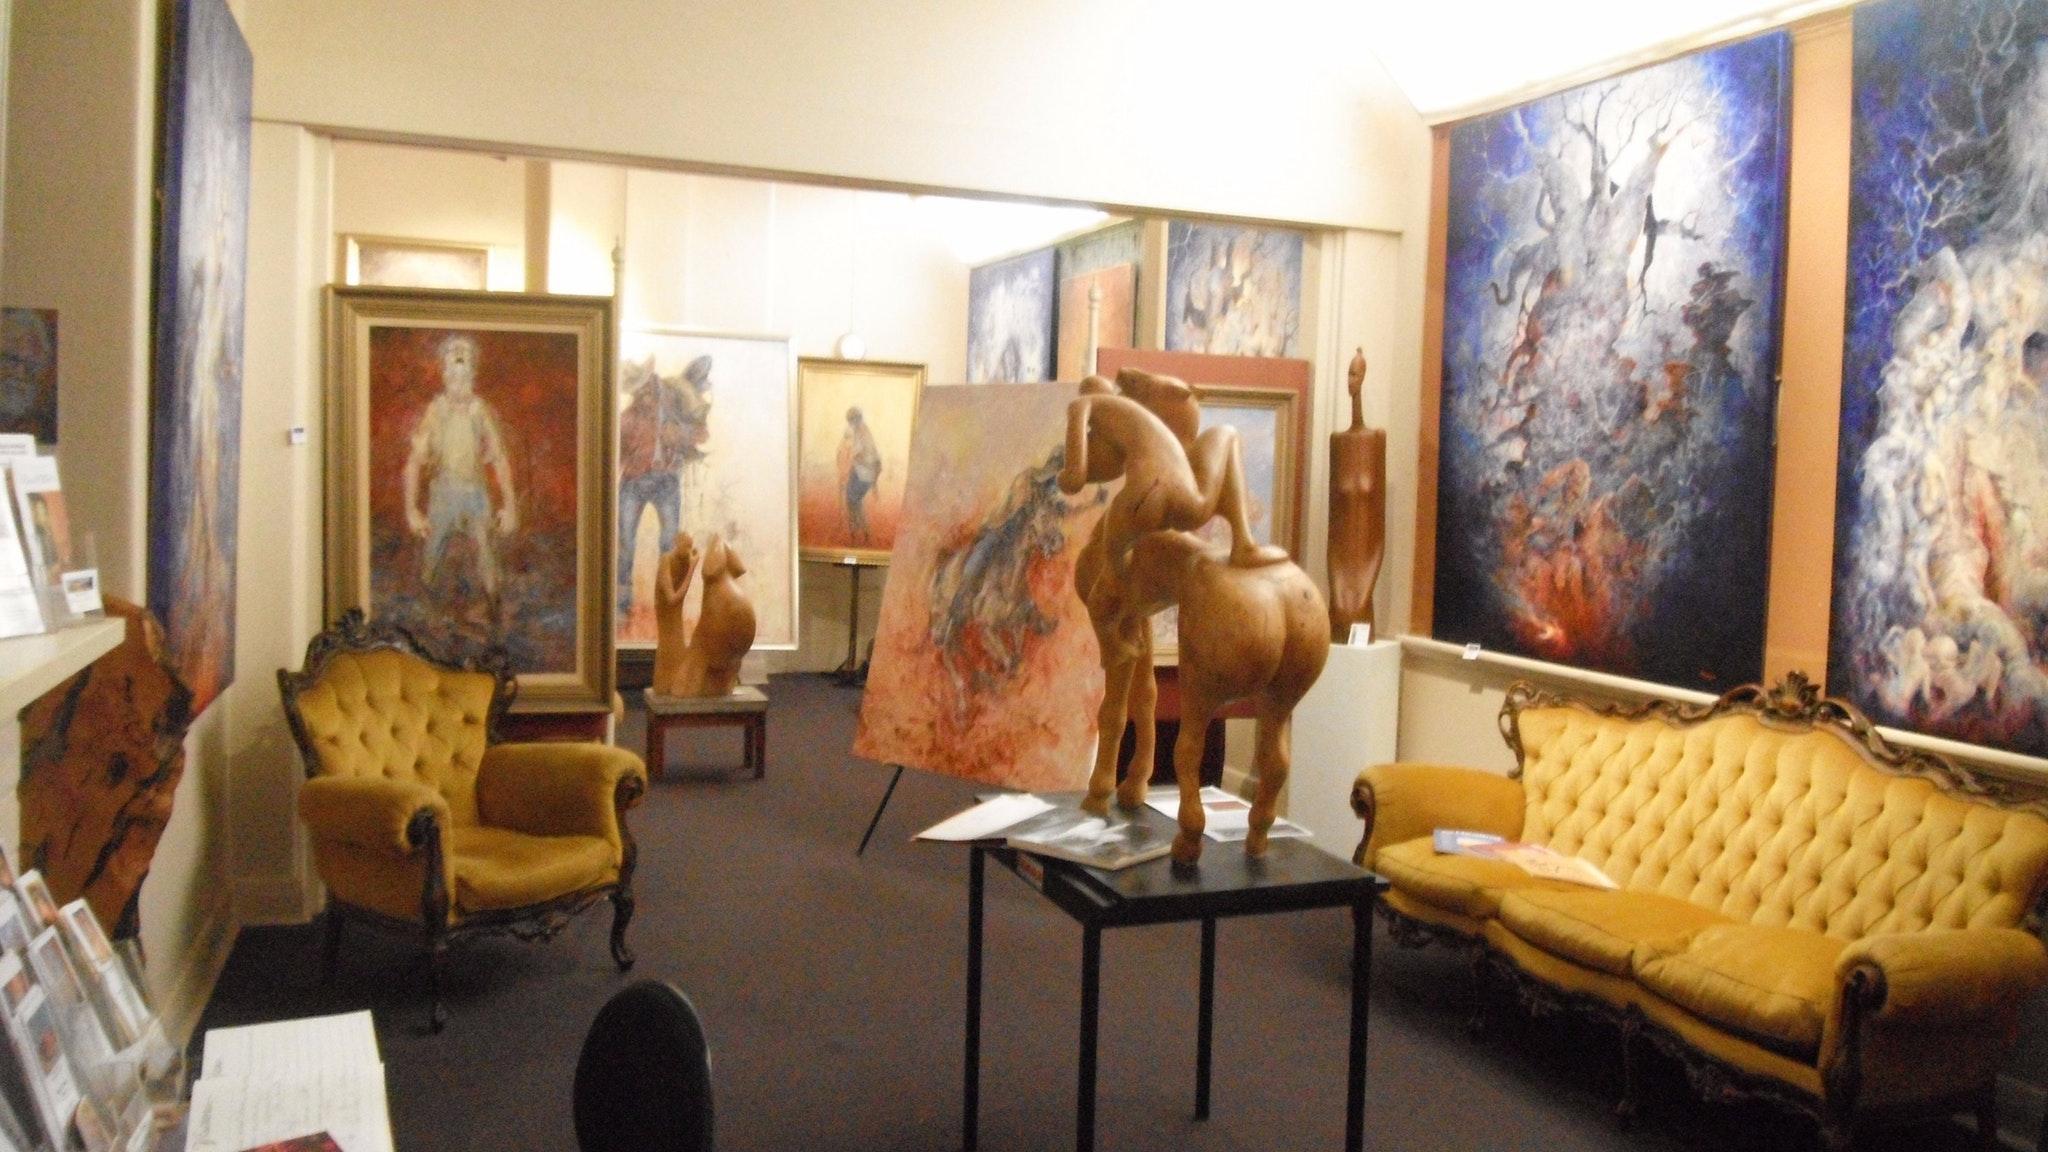 Nunan Gallery